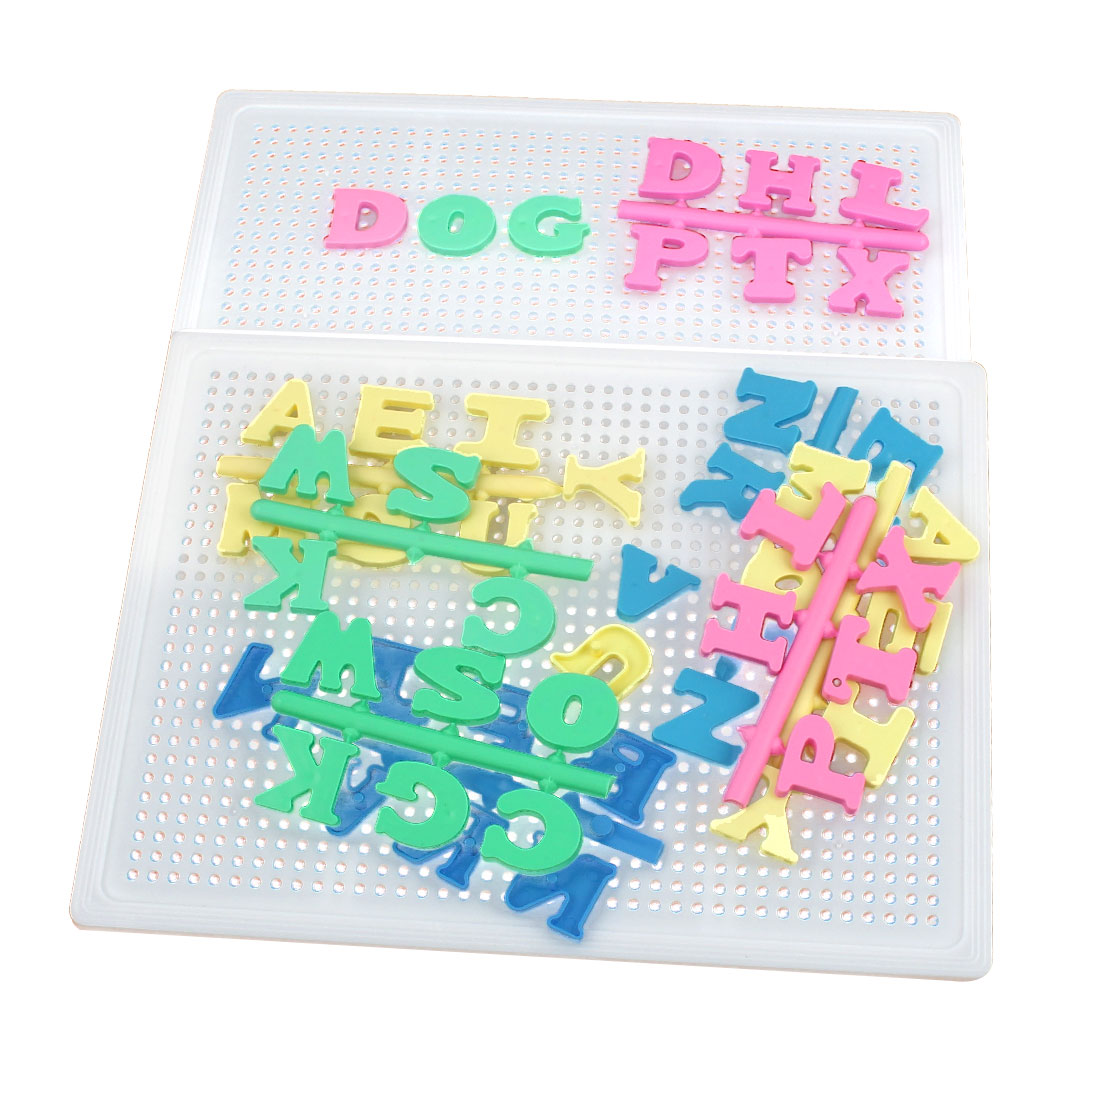 2 Pcs Plastic 26 Block Letters Intelligence Jigsaw Puzzle Set